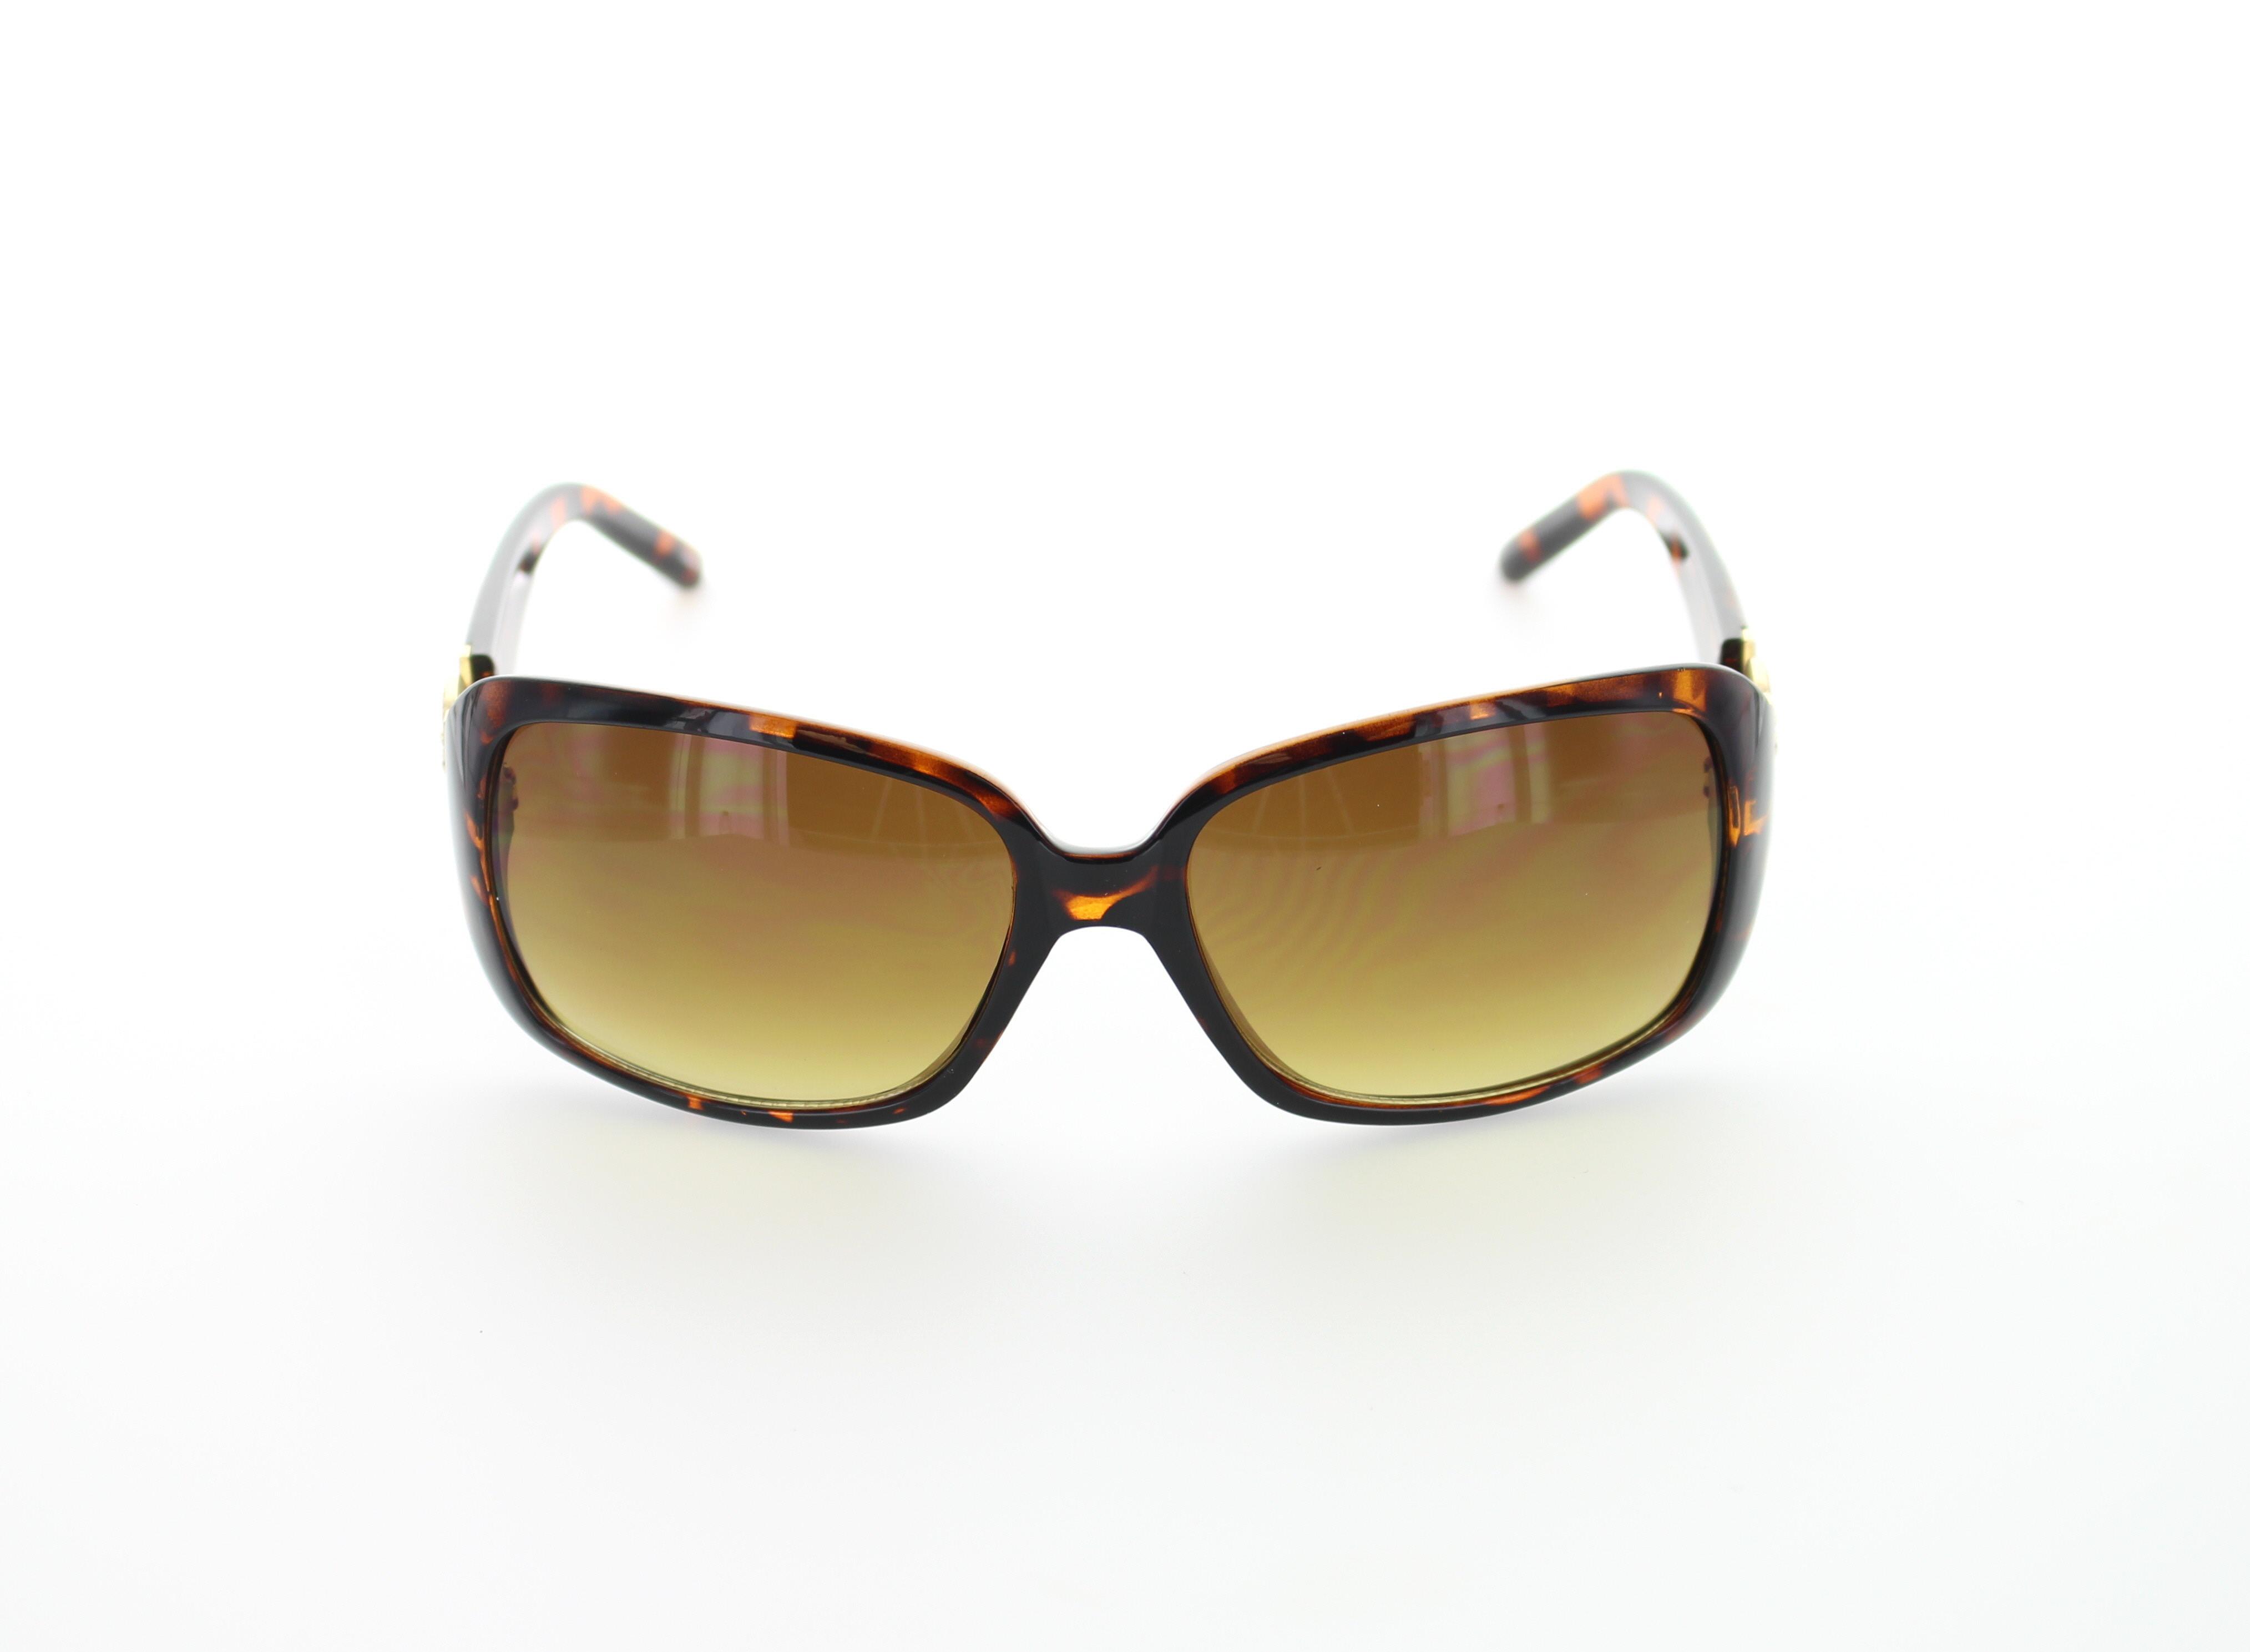 Fashion sunglasses online store 83